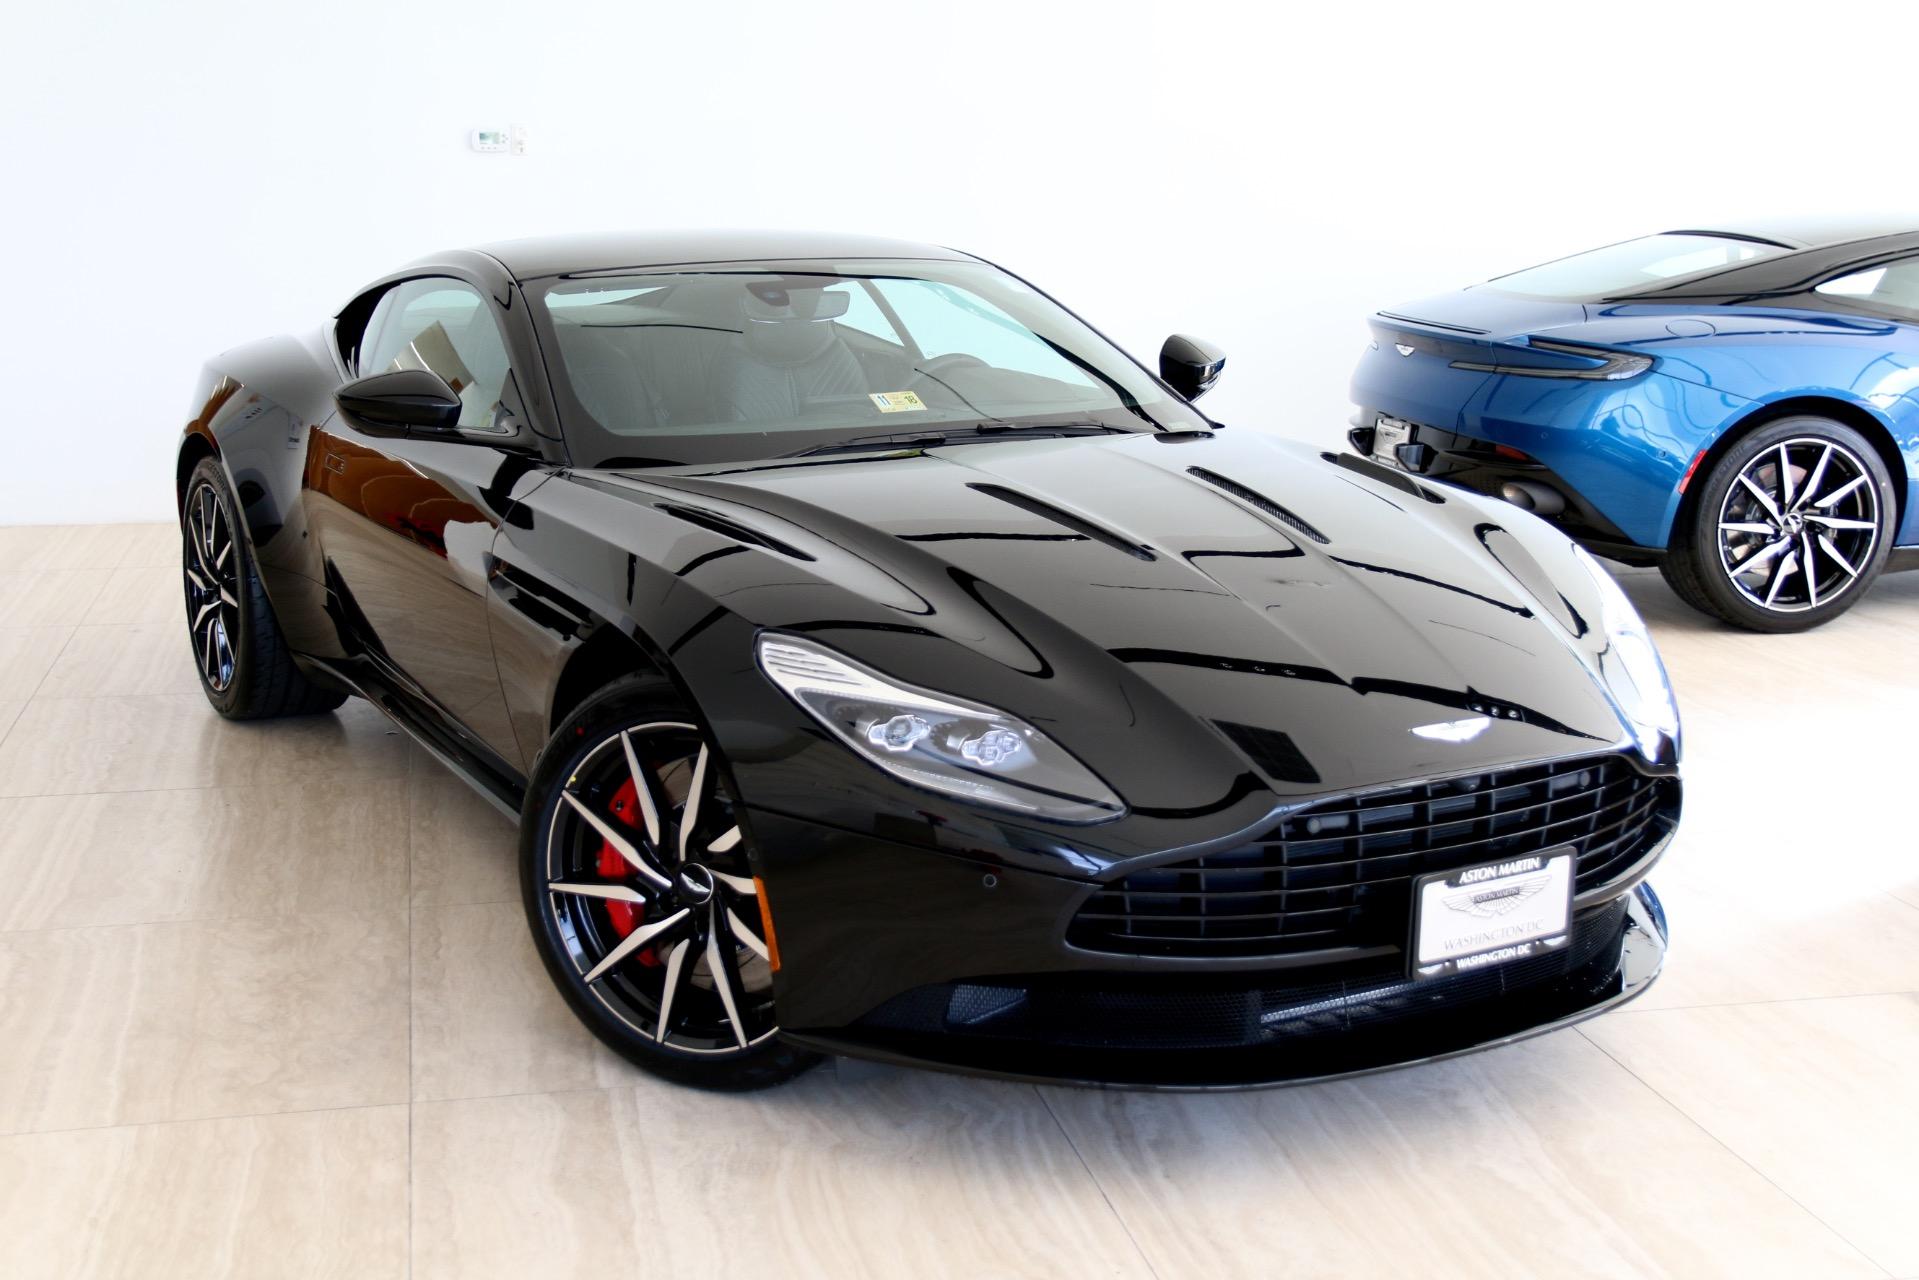 2018 Aston Martin Db11 V12 Stock 8l03667 For Sale Near Vienna Va